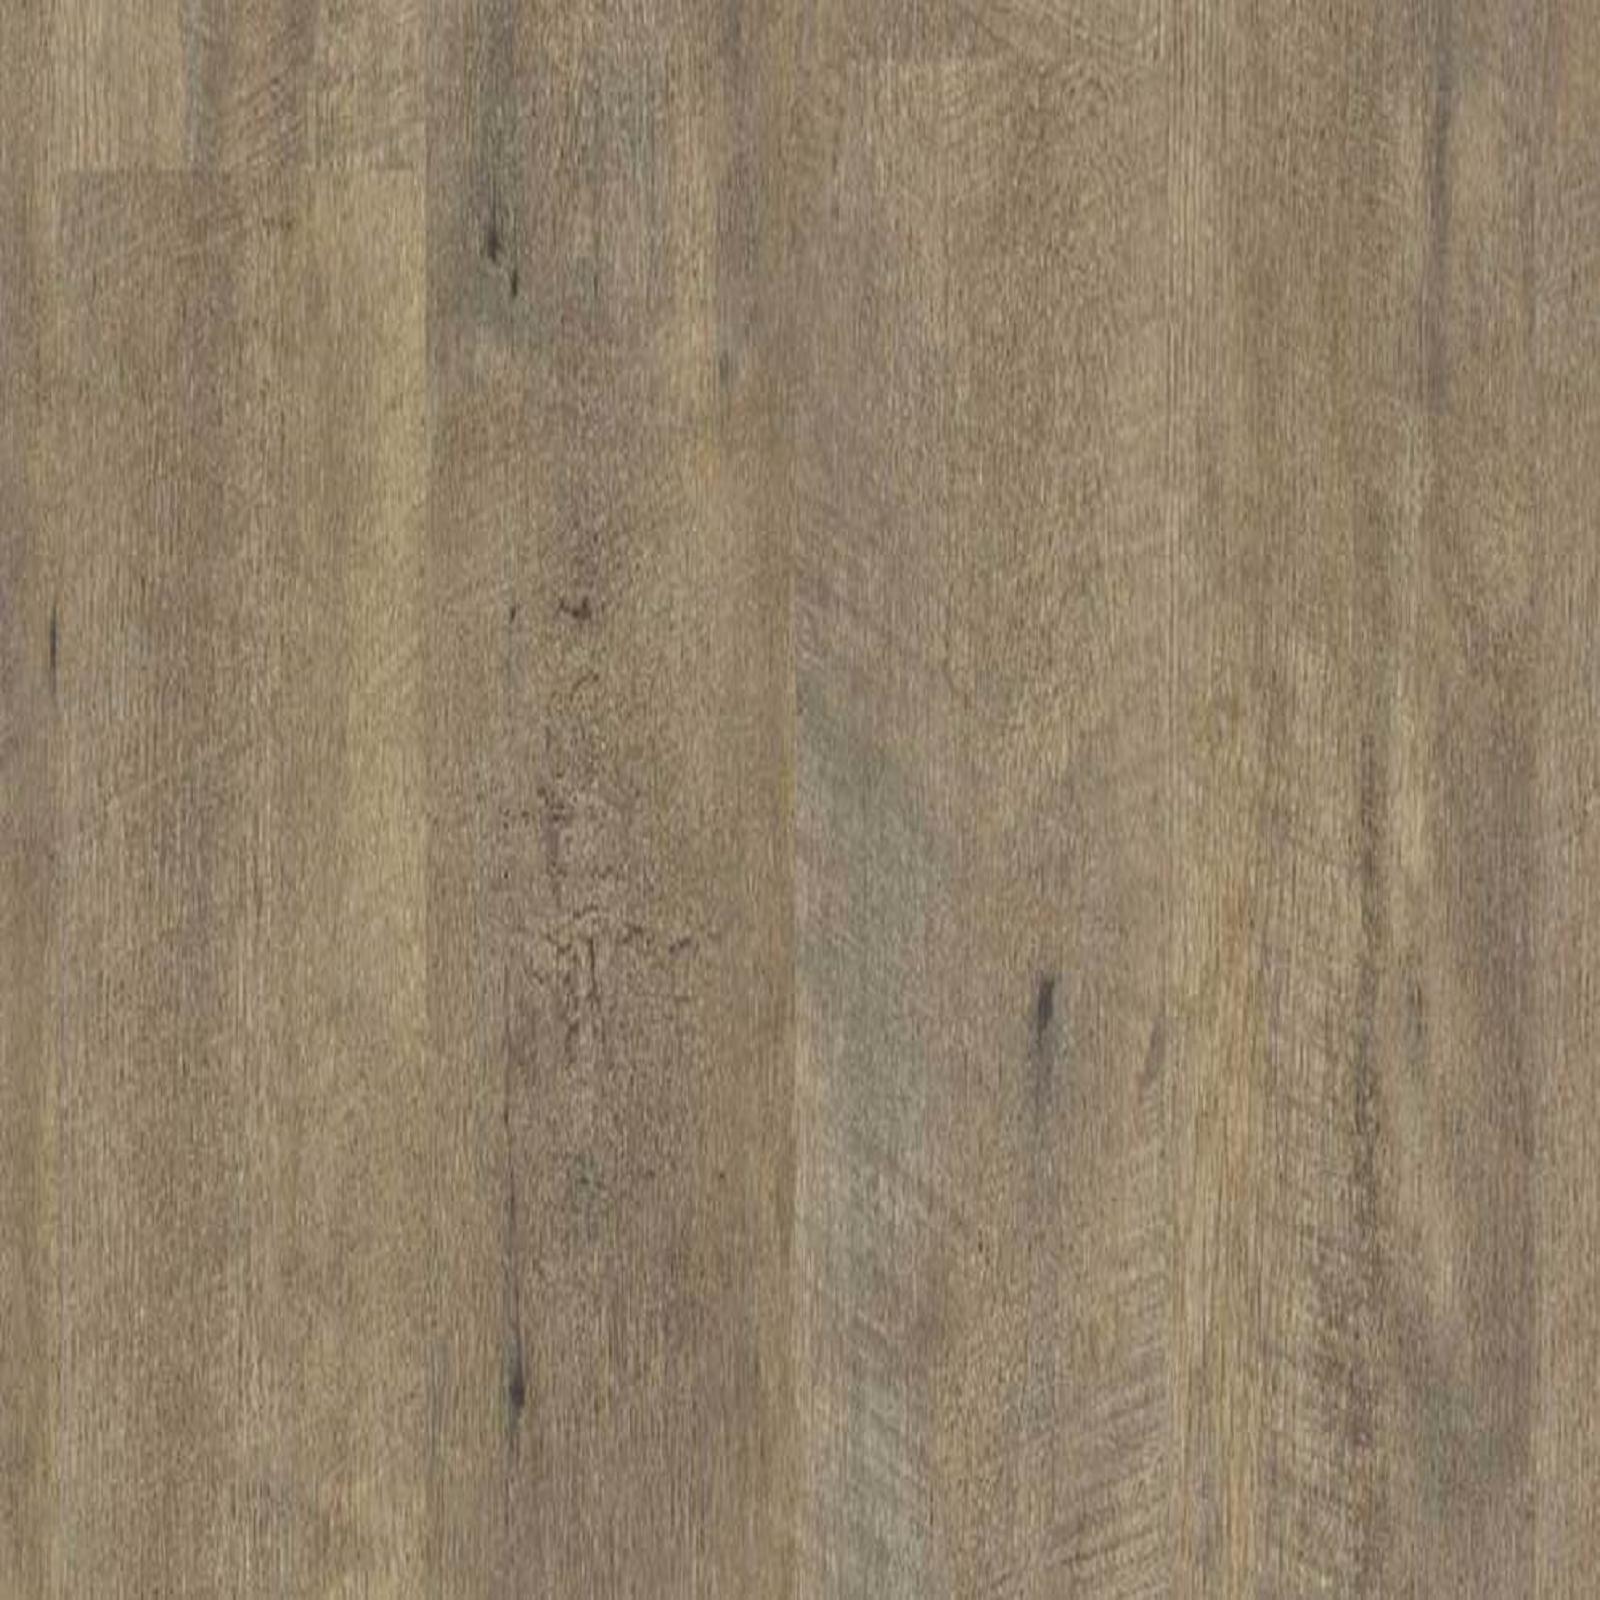 Senso Rustic 914 x 152 x 2mm 2.20m2 Walnut Self Adhesive Vinyl Planks - 16 Pack